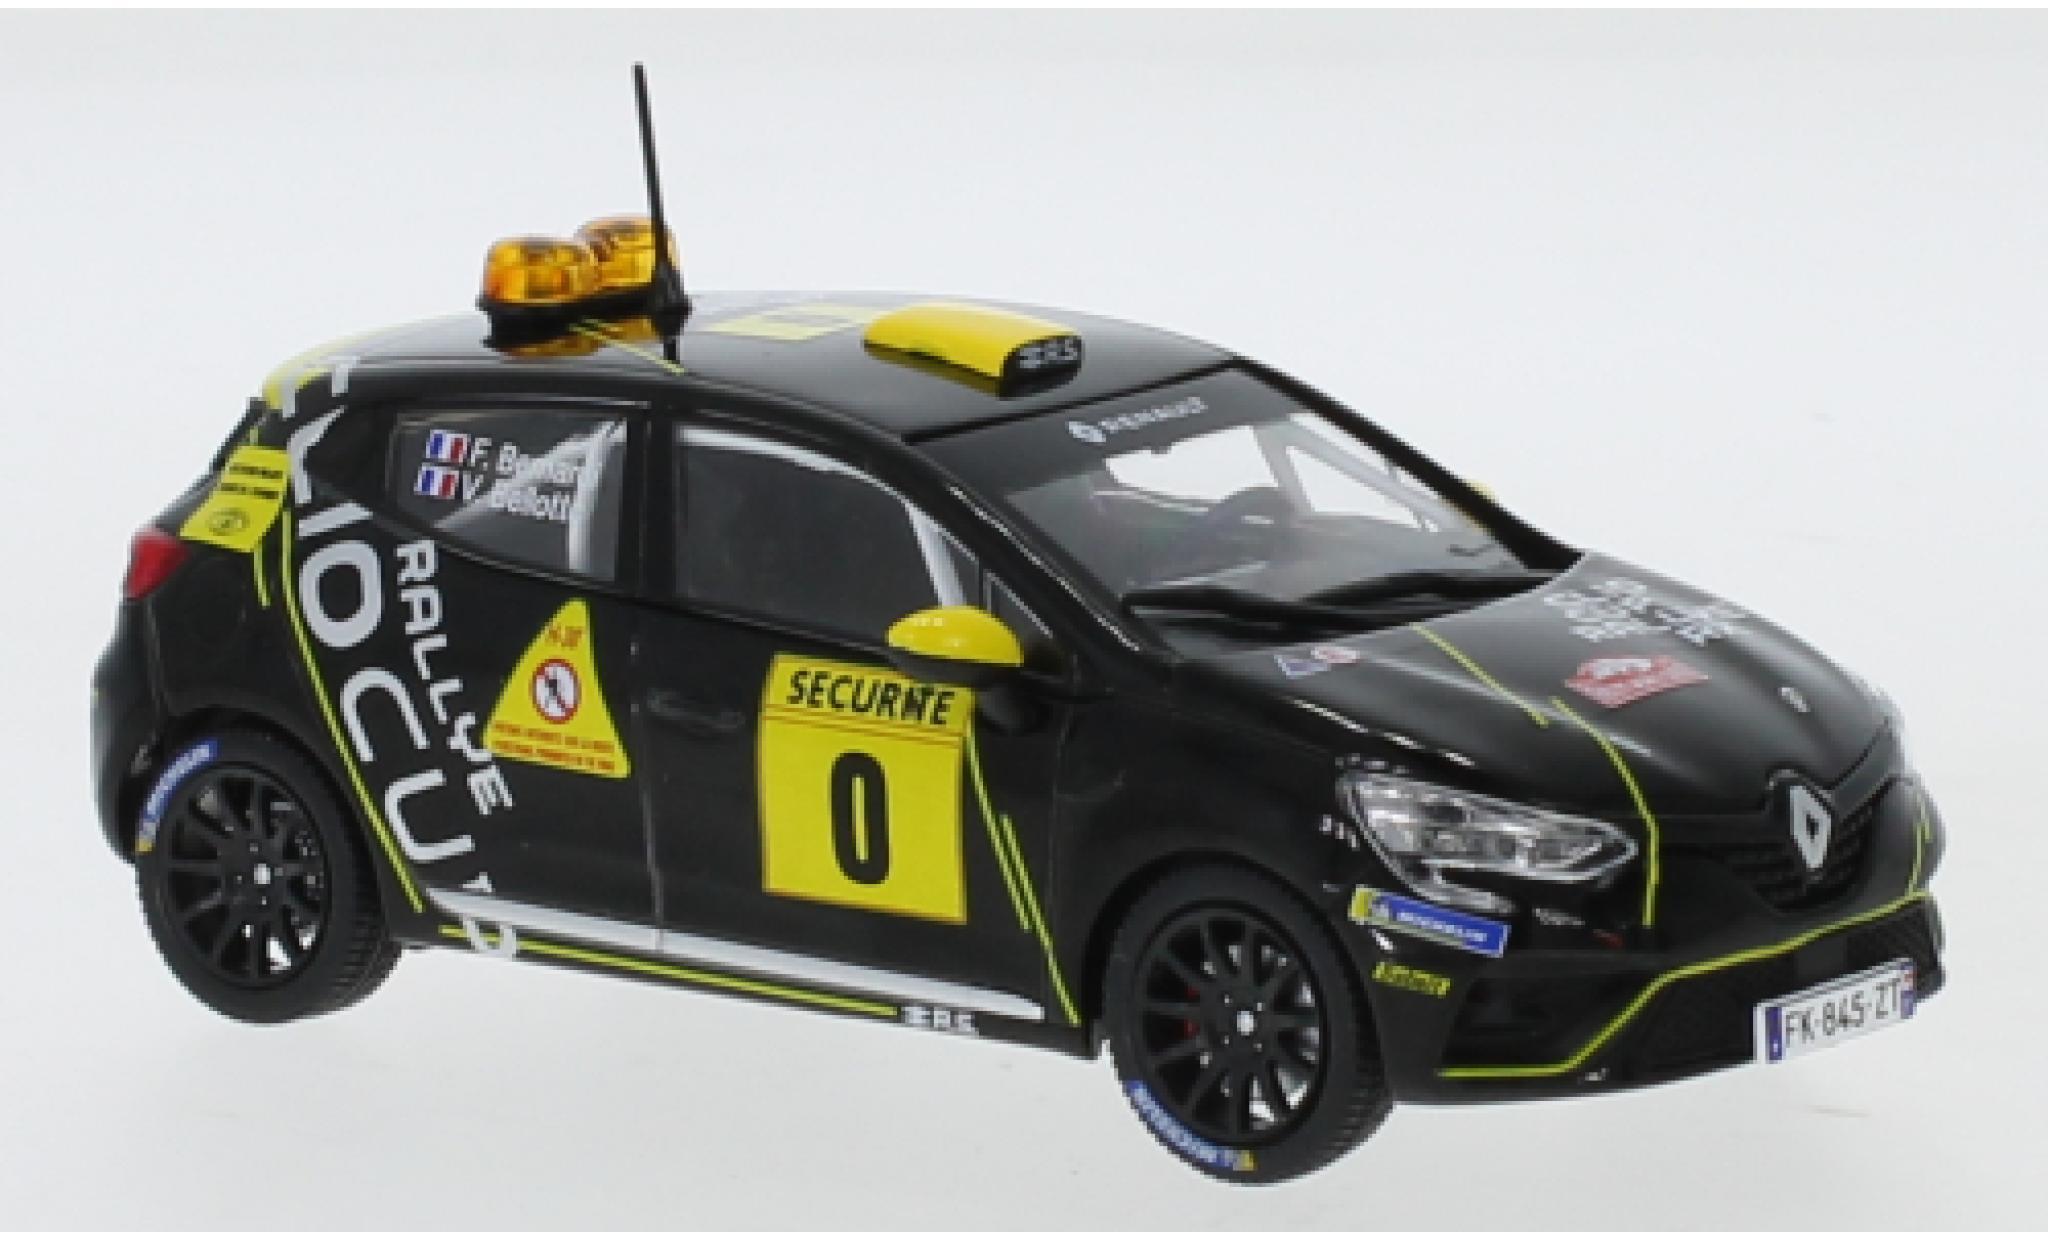 Renault Clio 1/43 IXO Rally Rallye WM Rally Monte Carlo 2020 F.Bernardi/V.Bellotto